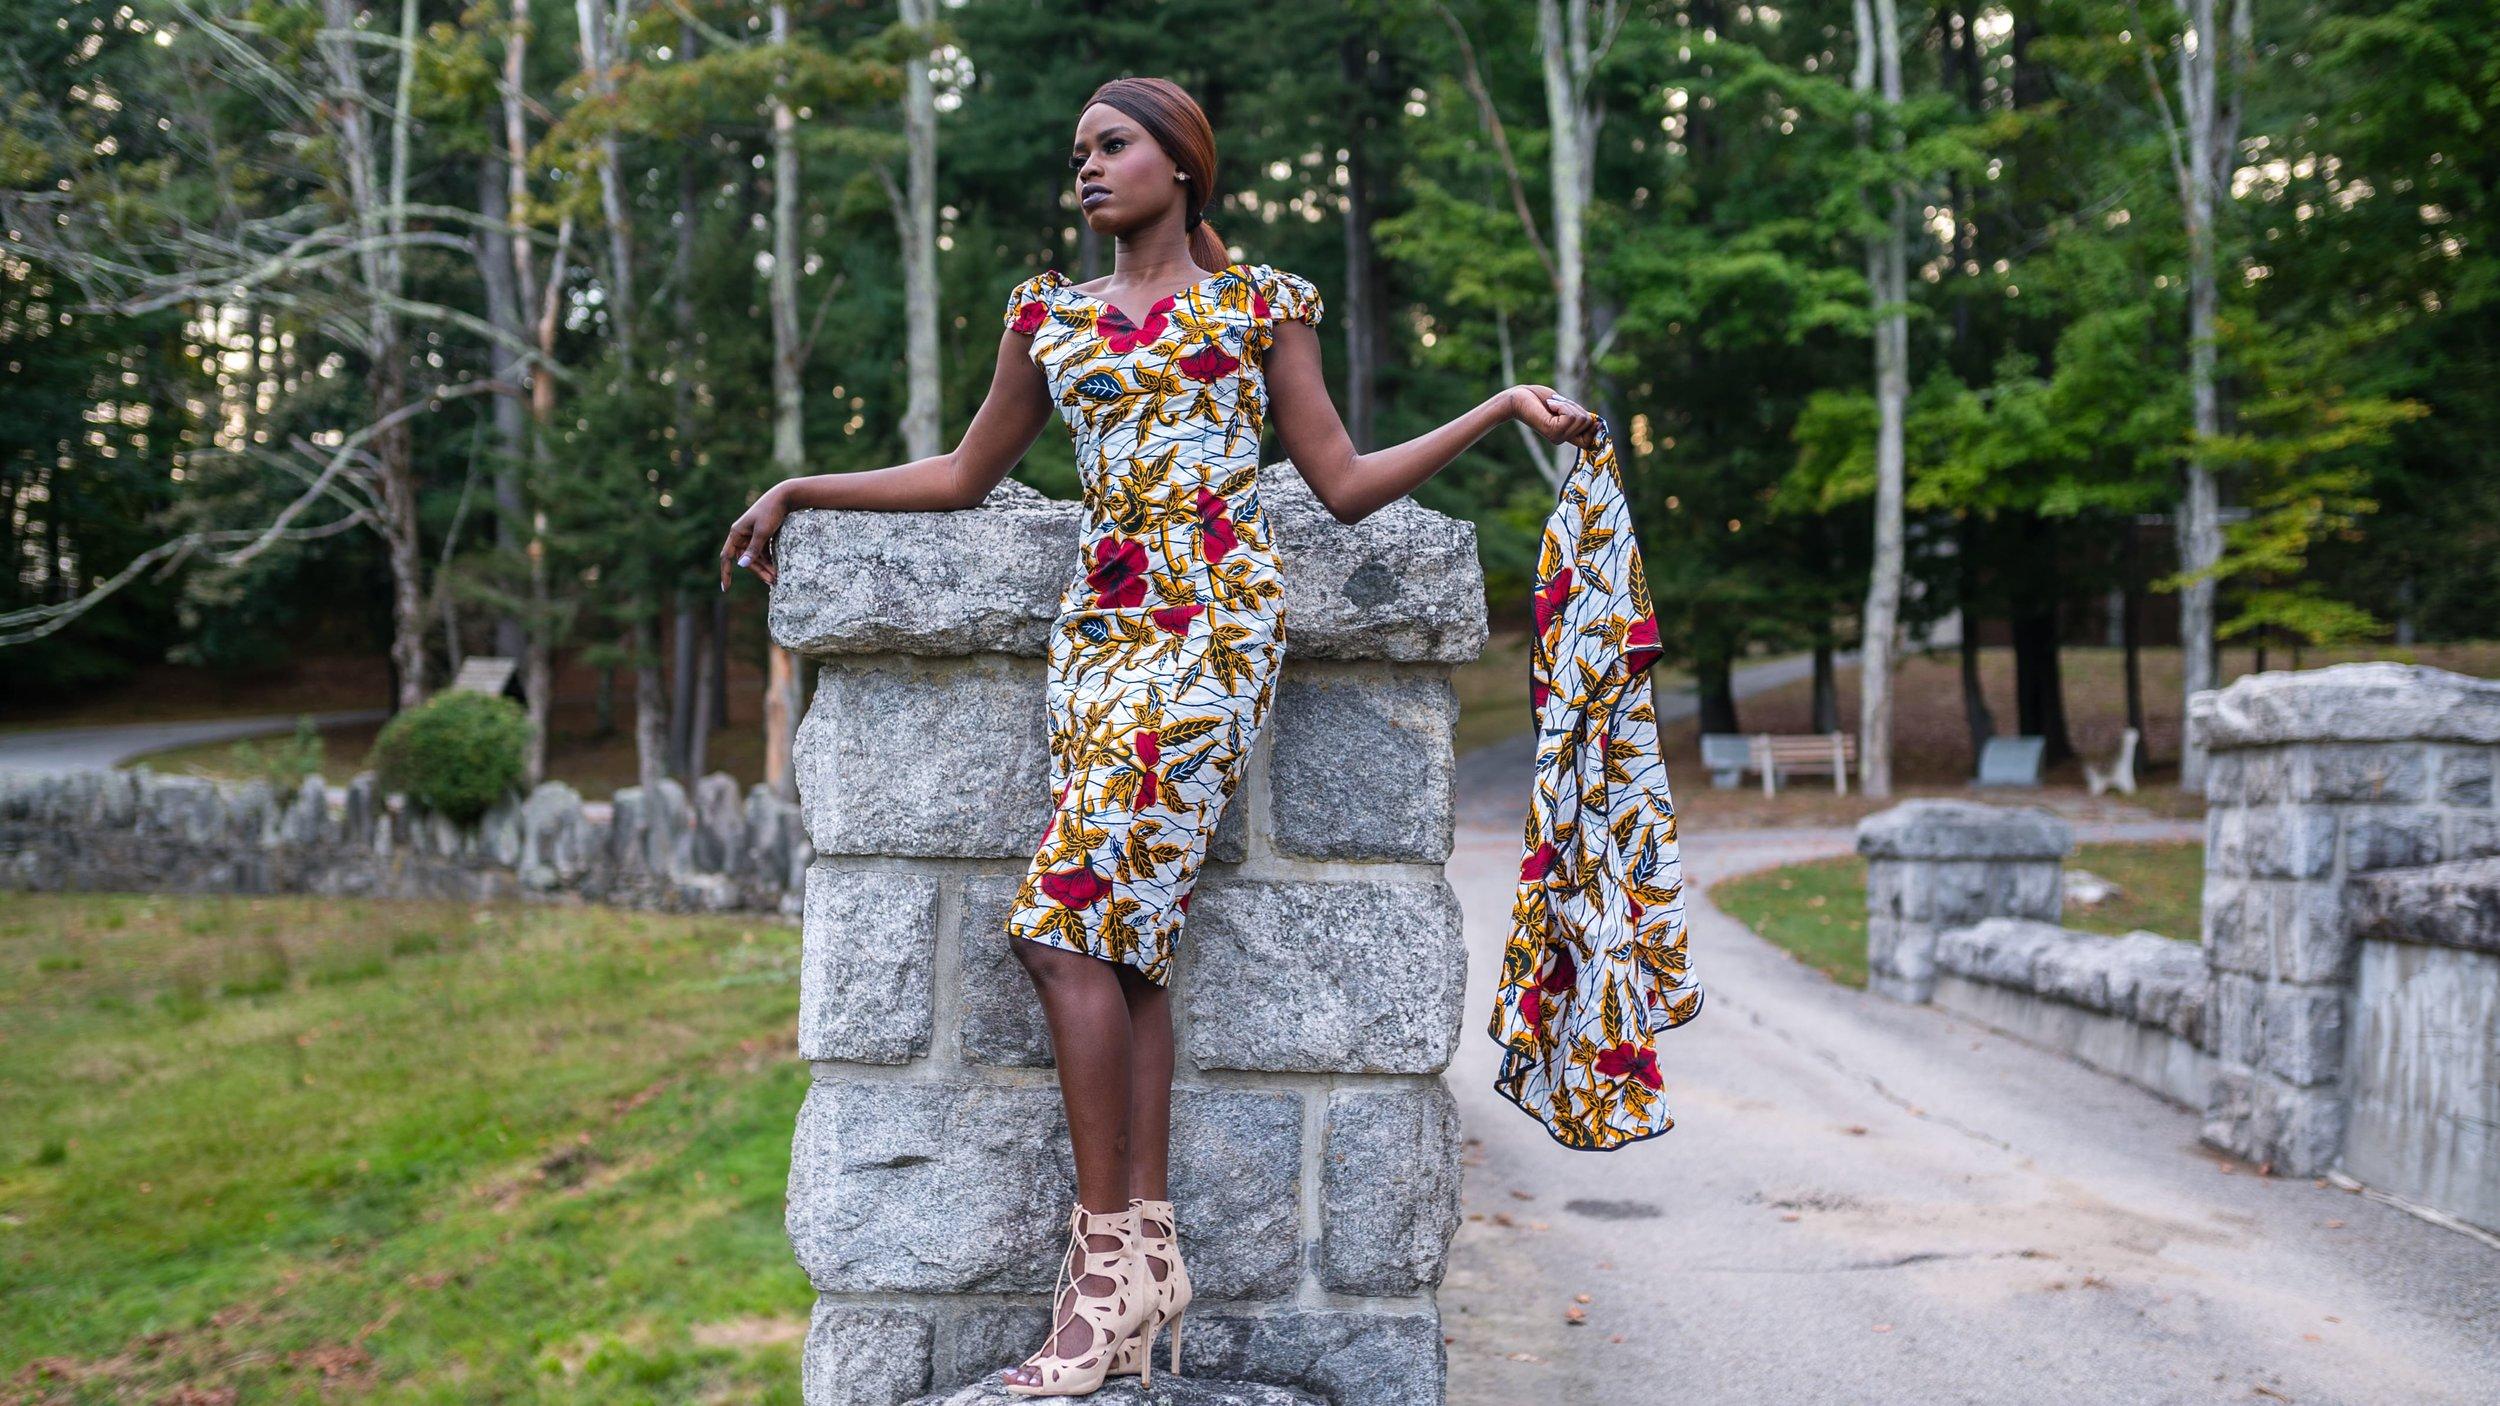 VinnyMwano_Fashion Editorial 6-min.jpg